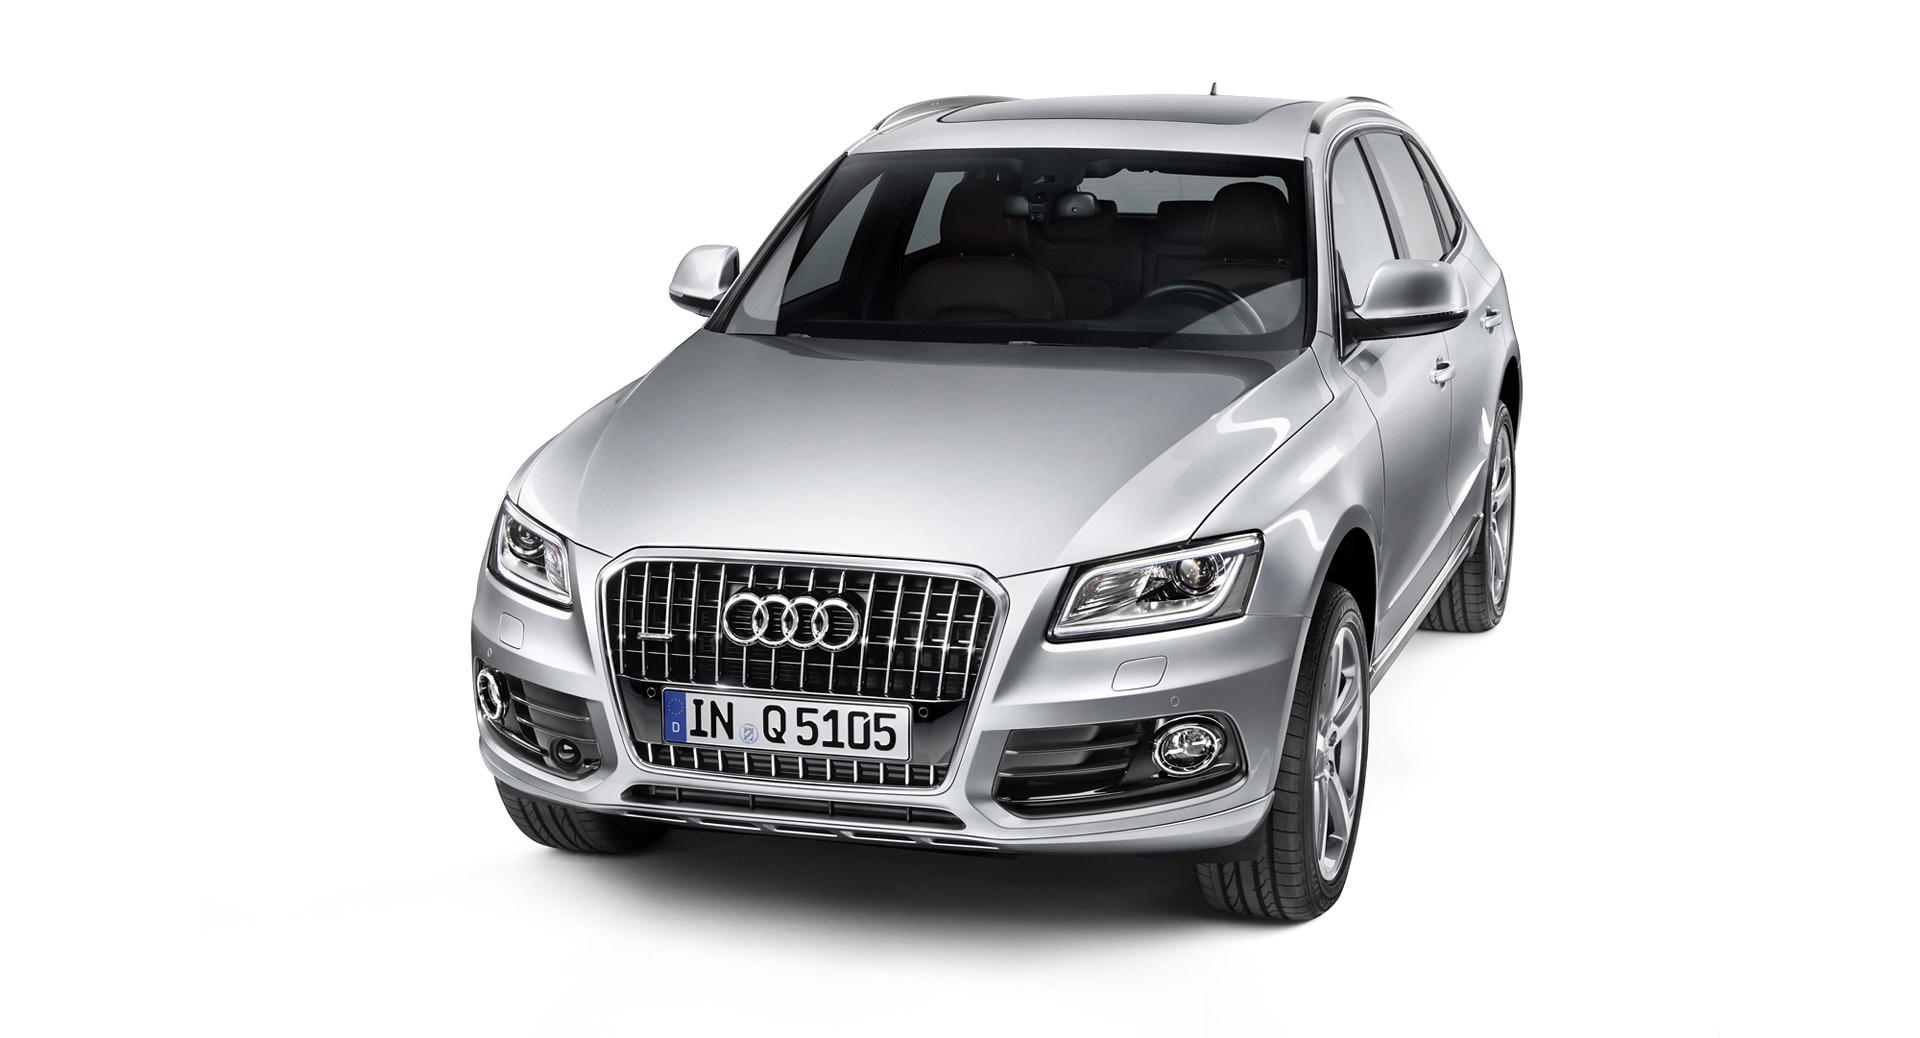 Audi Q5, Audi Q5, Anke Luckmann, DDB, transportation, Spain, barcelona, marta calheiros, campaign, studio